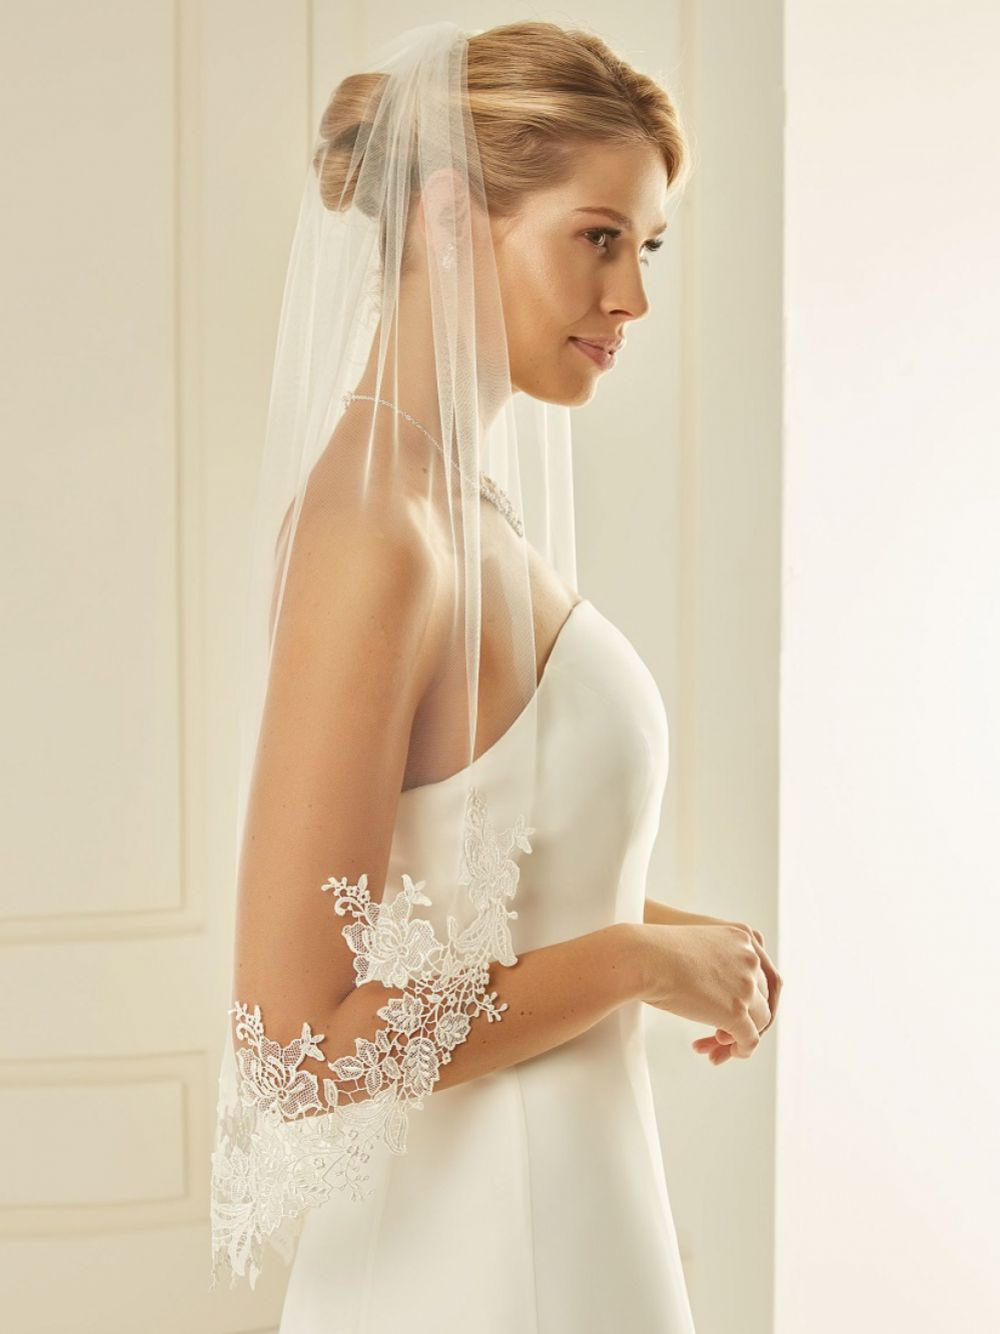 Bianco Single Tier Cut Edge Waist Length Veil with Floral Lace S238